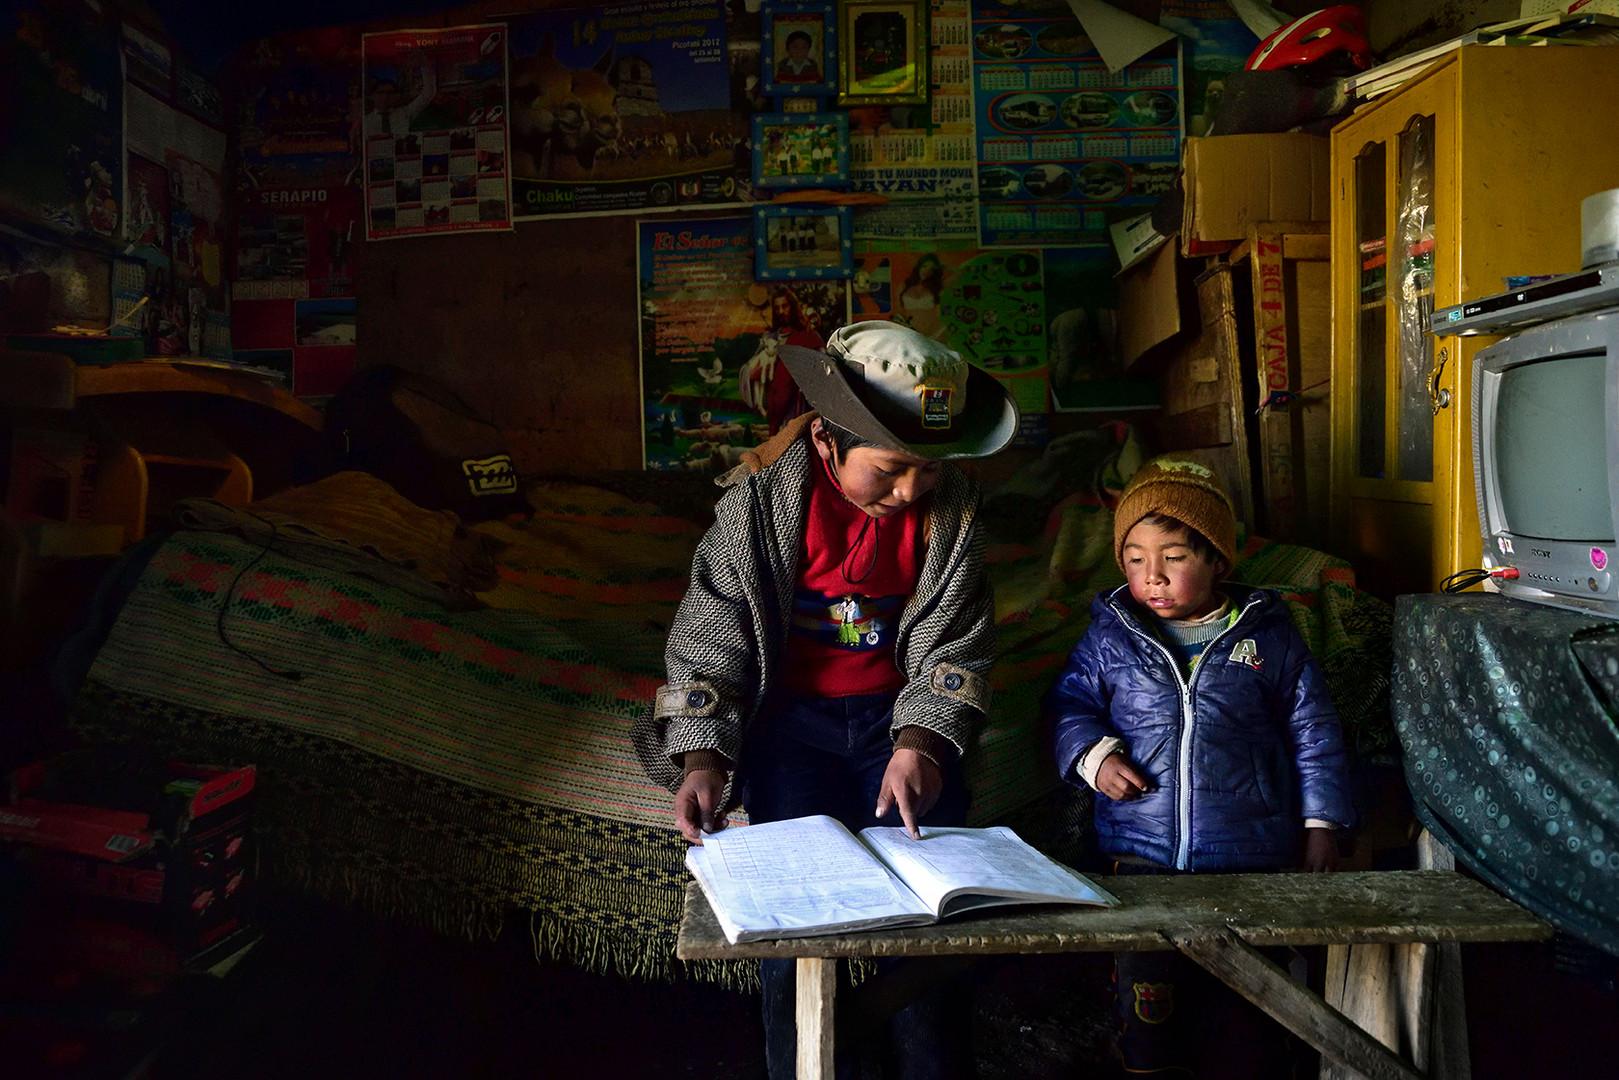 Peru 18 -  Picotani day2 - Jon, esquila,